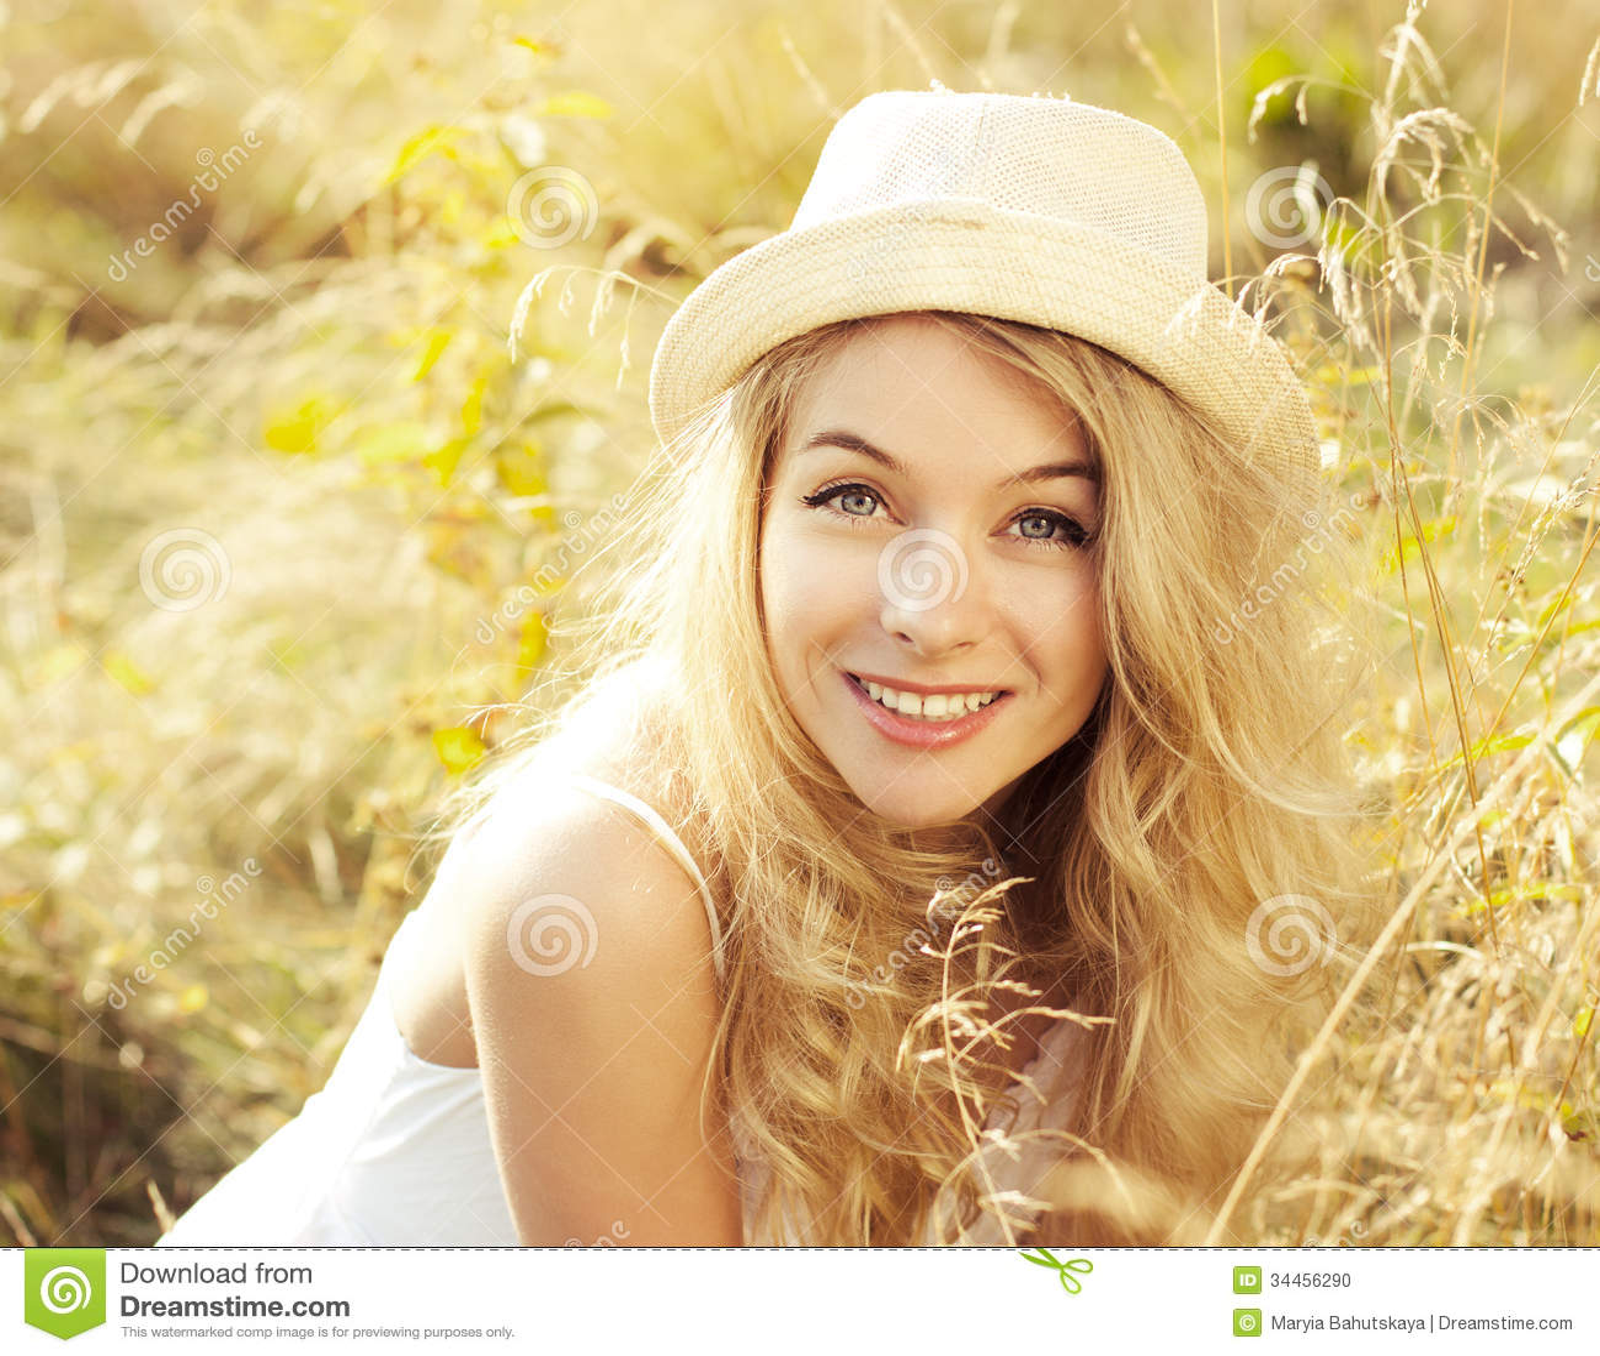 Portrait Of Blonde Wom...